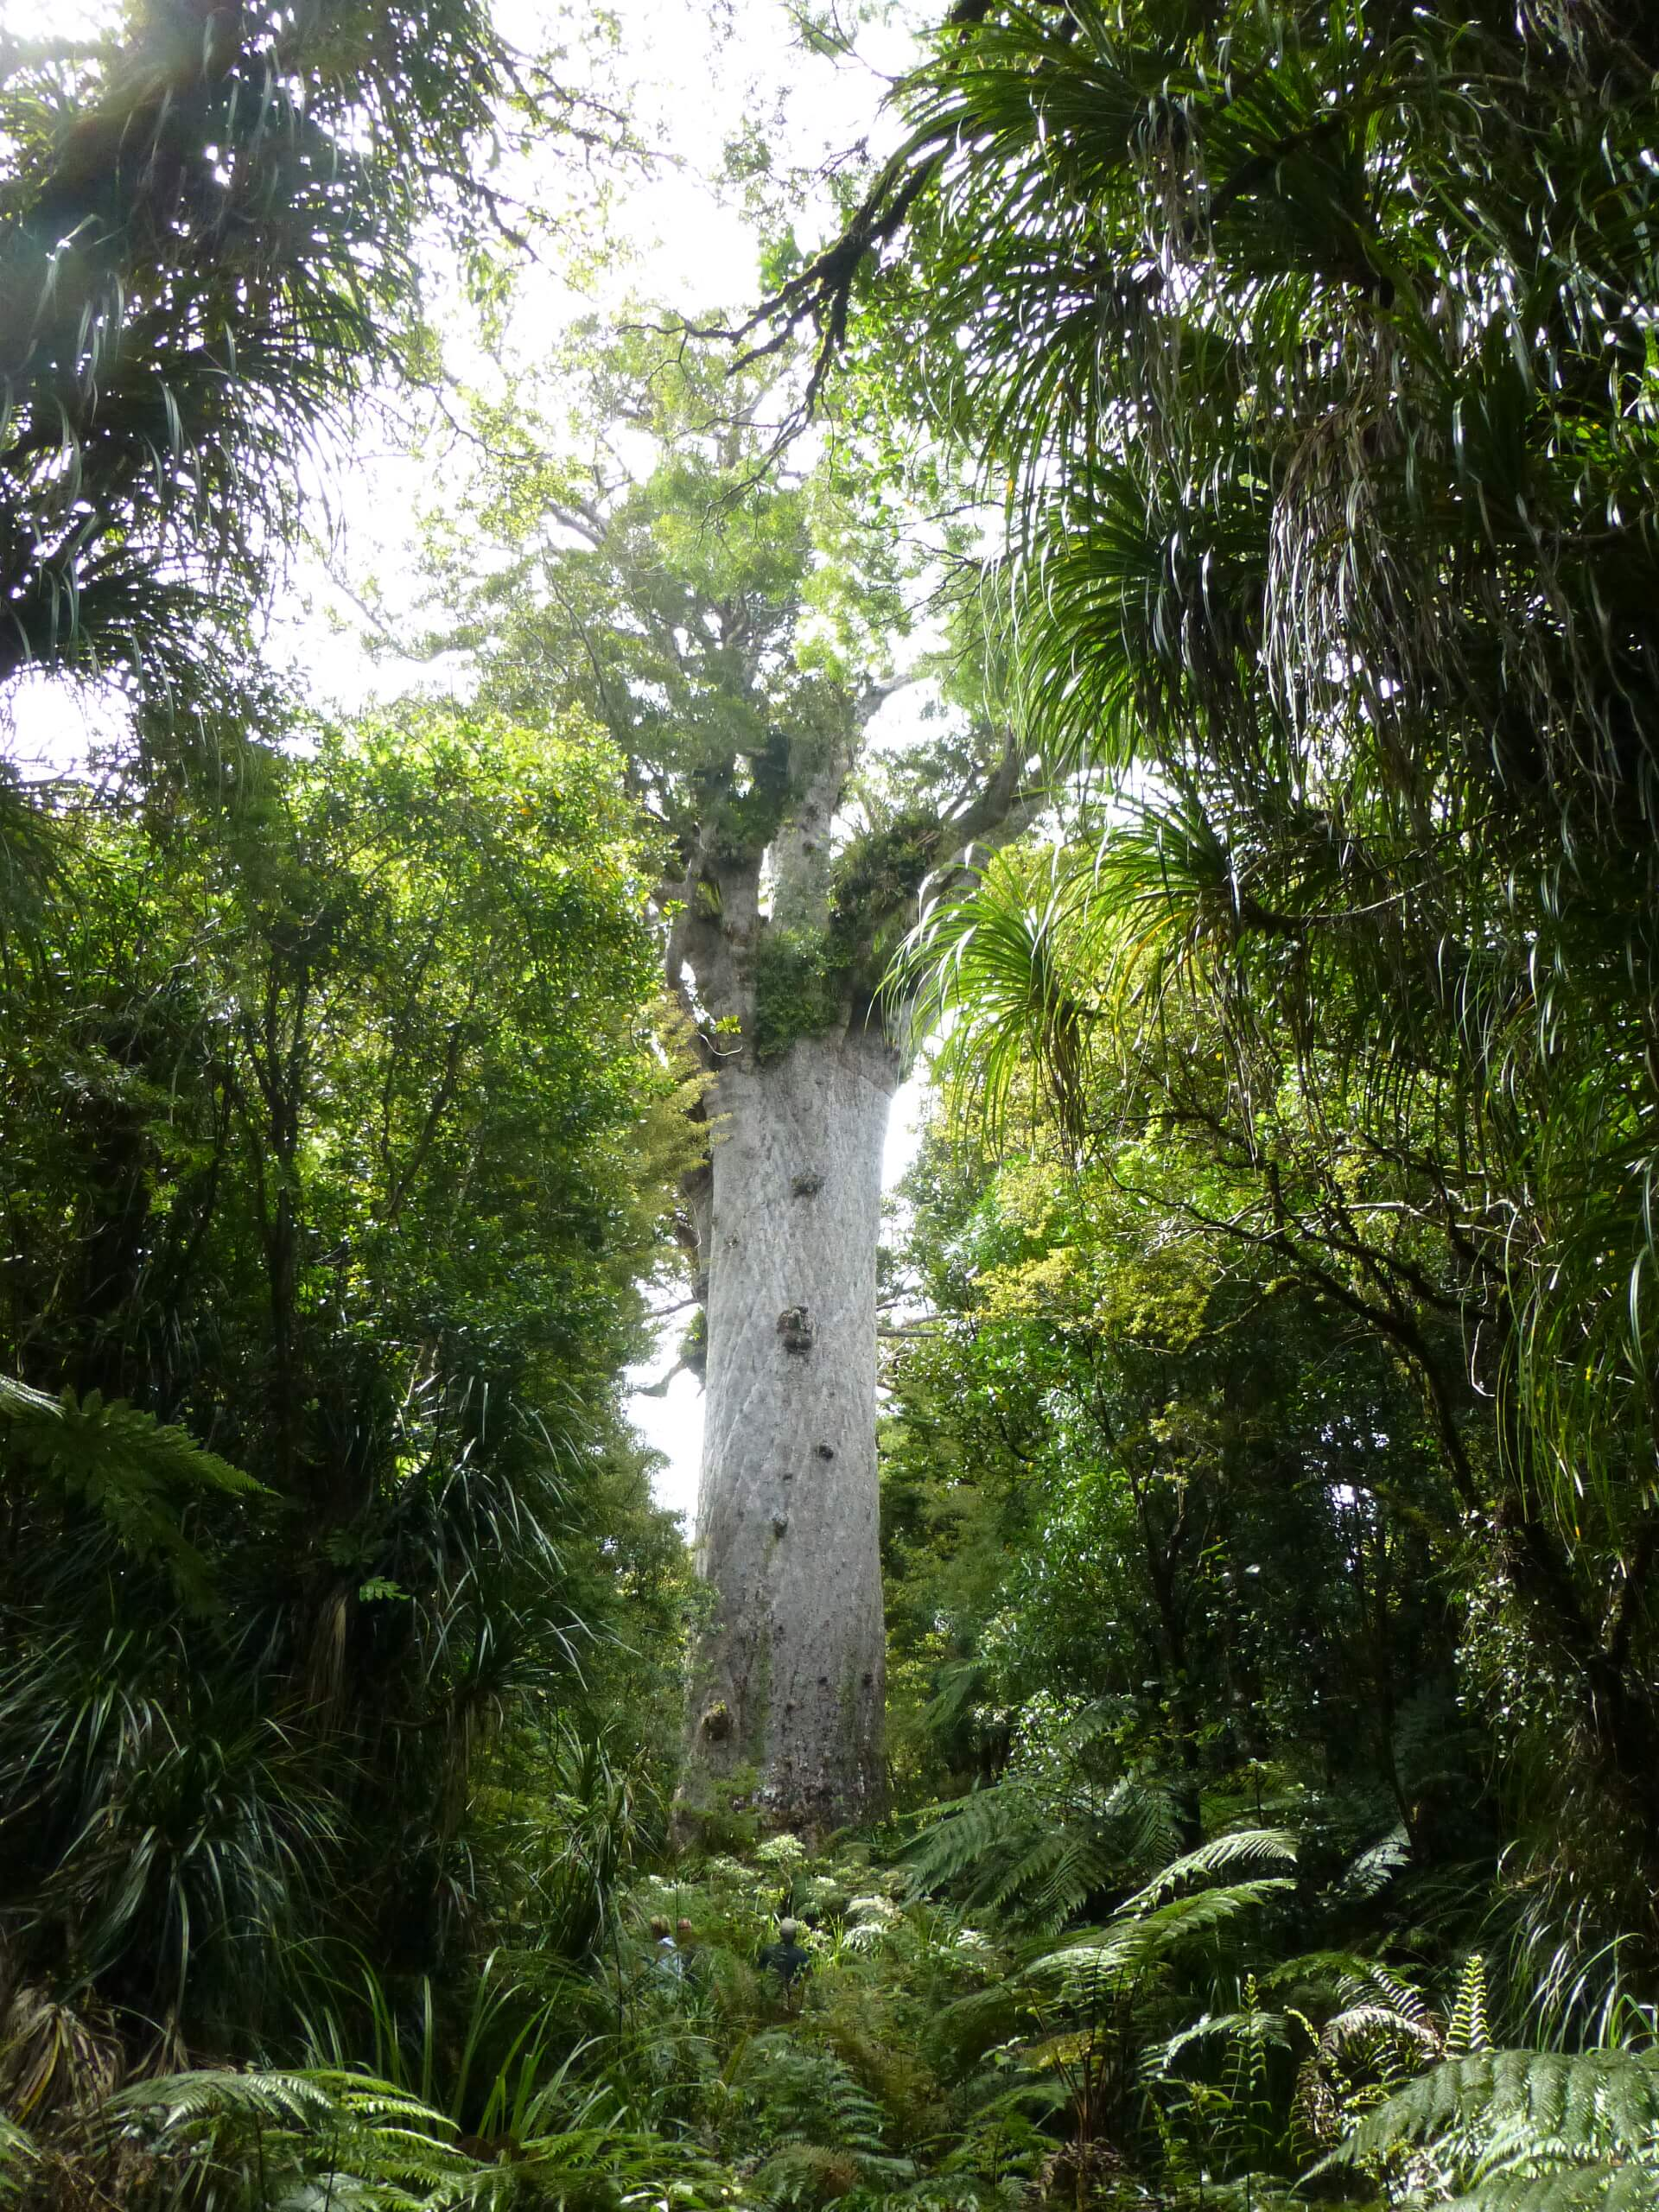 weit weg reisen, Waipoua Forest, Tane Mahuta 13